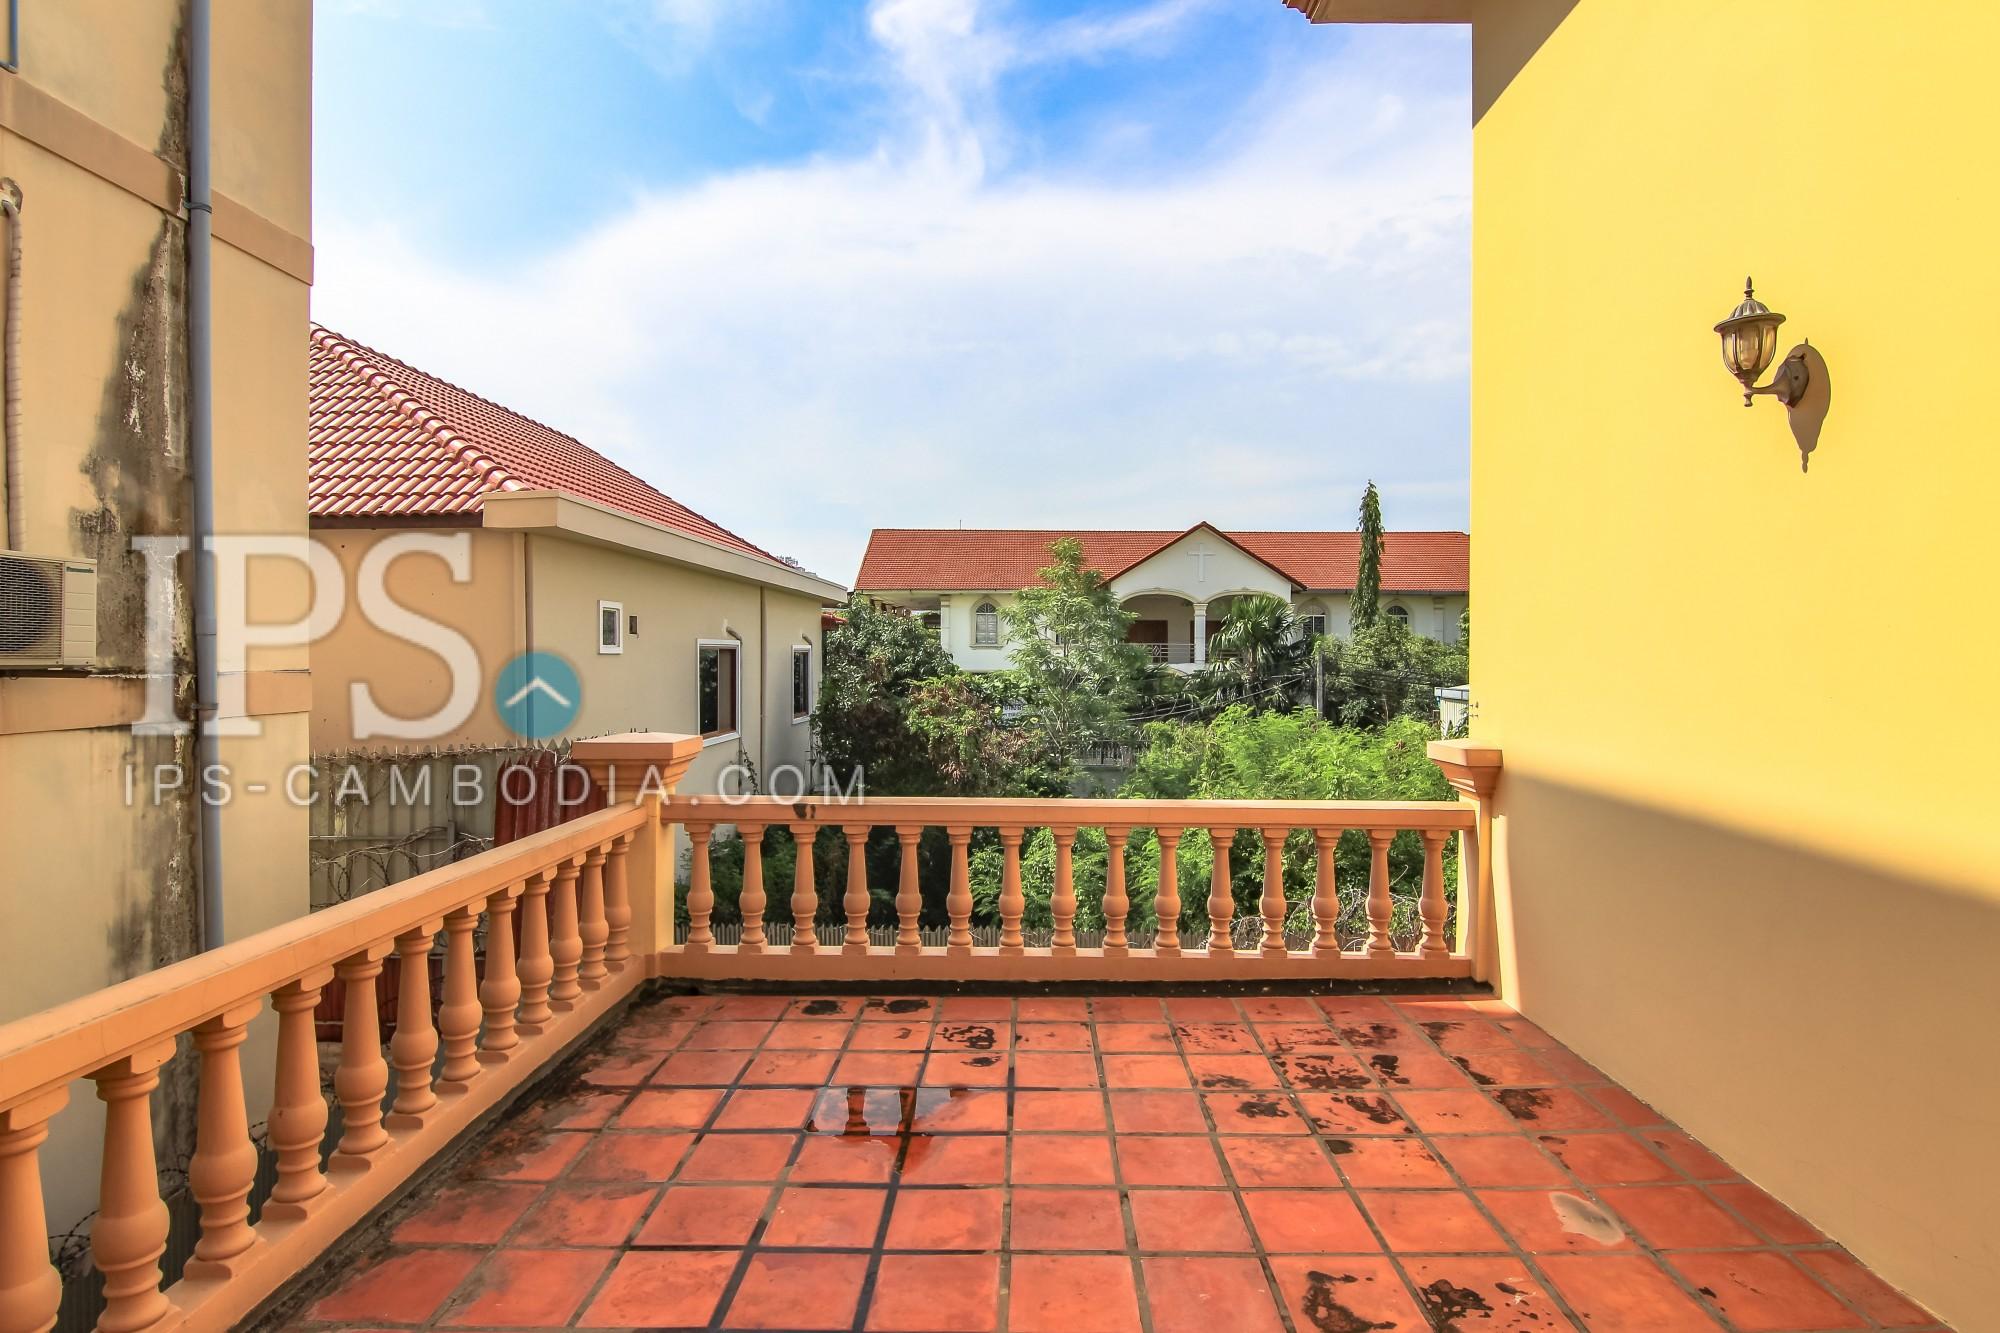 Four Bedroom Villa for rent in Phnom Penh near Toul Toum Pong Market